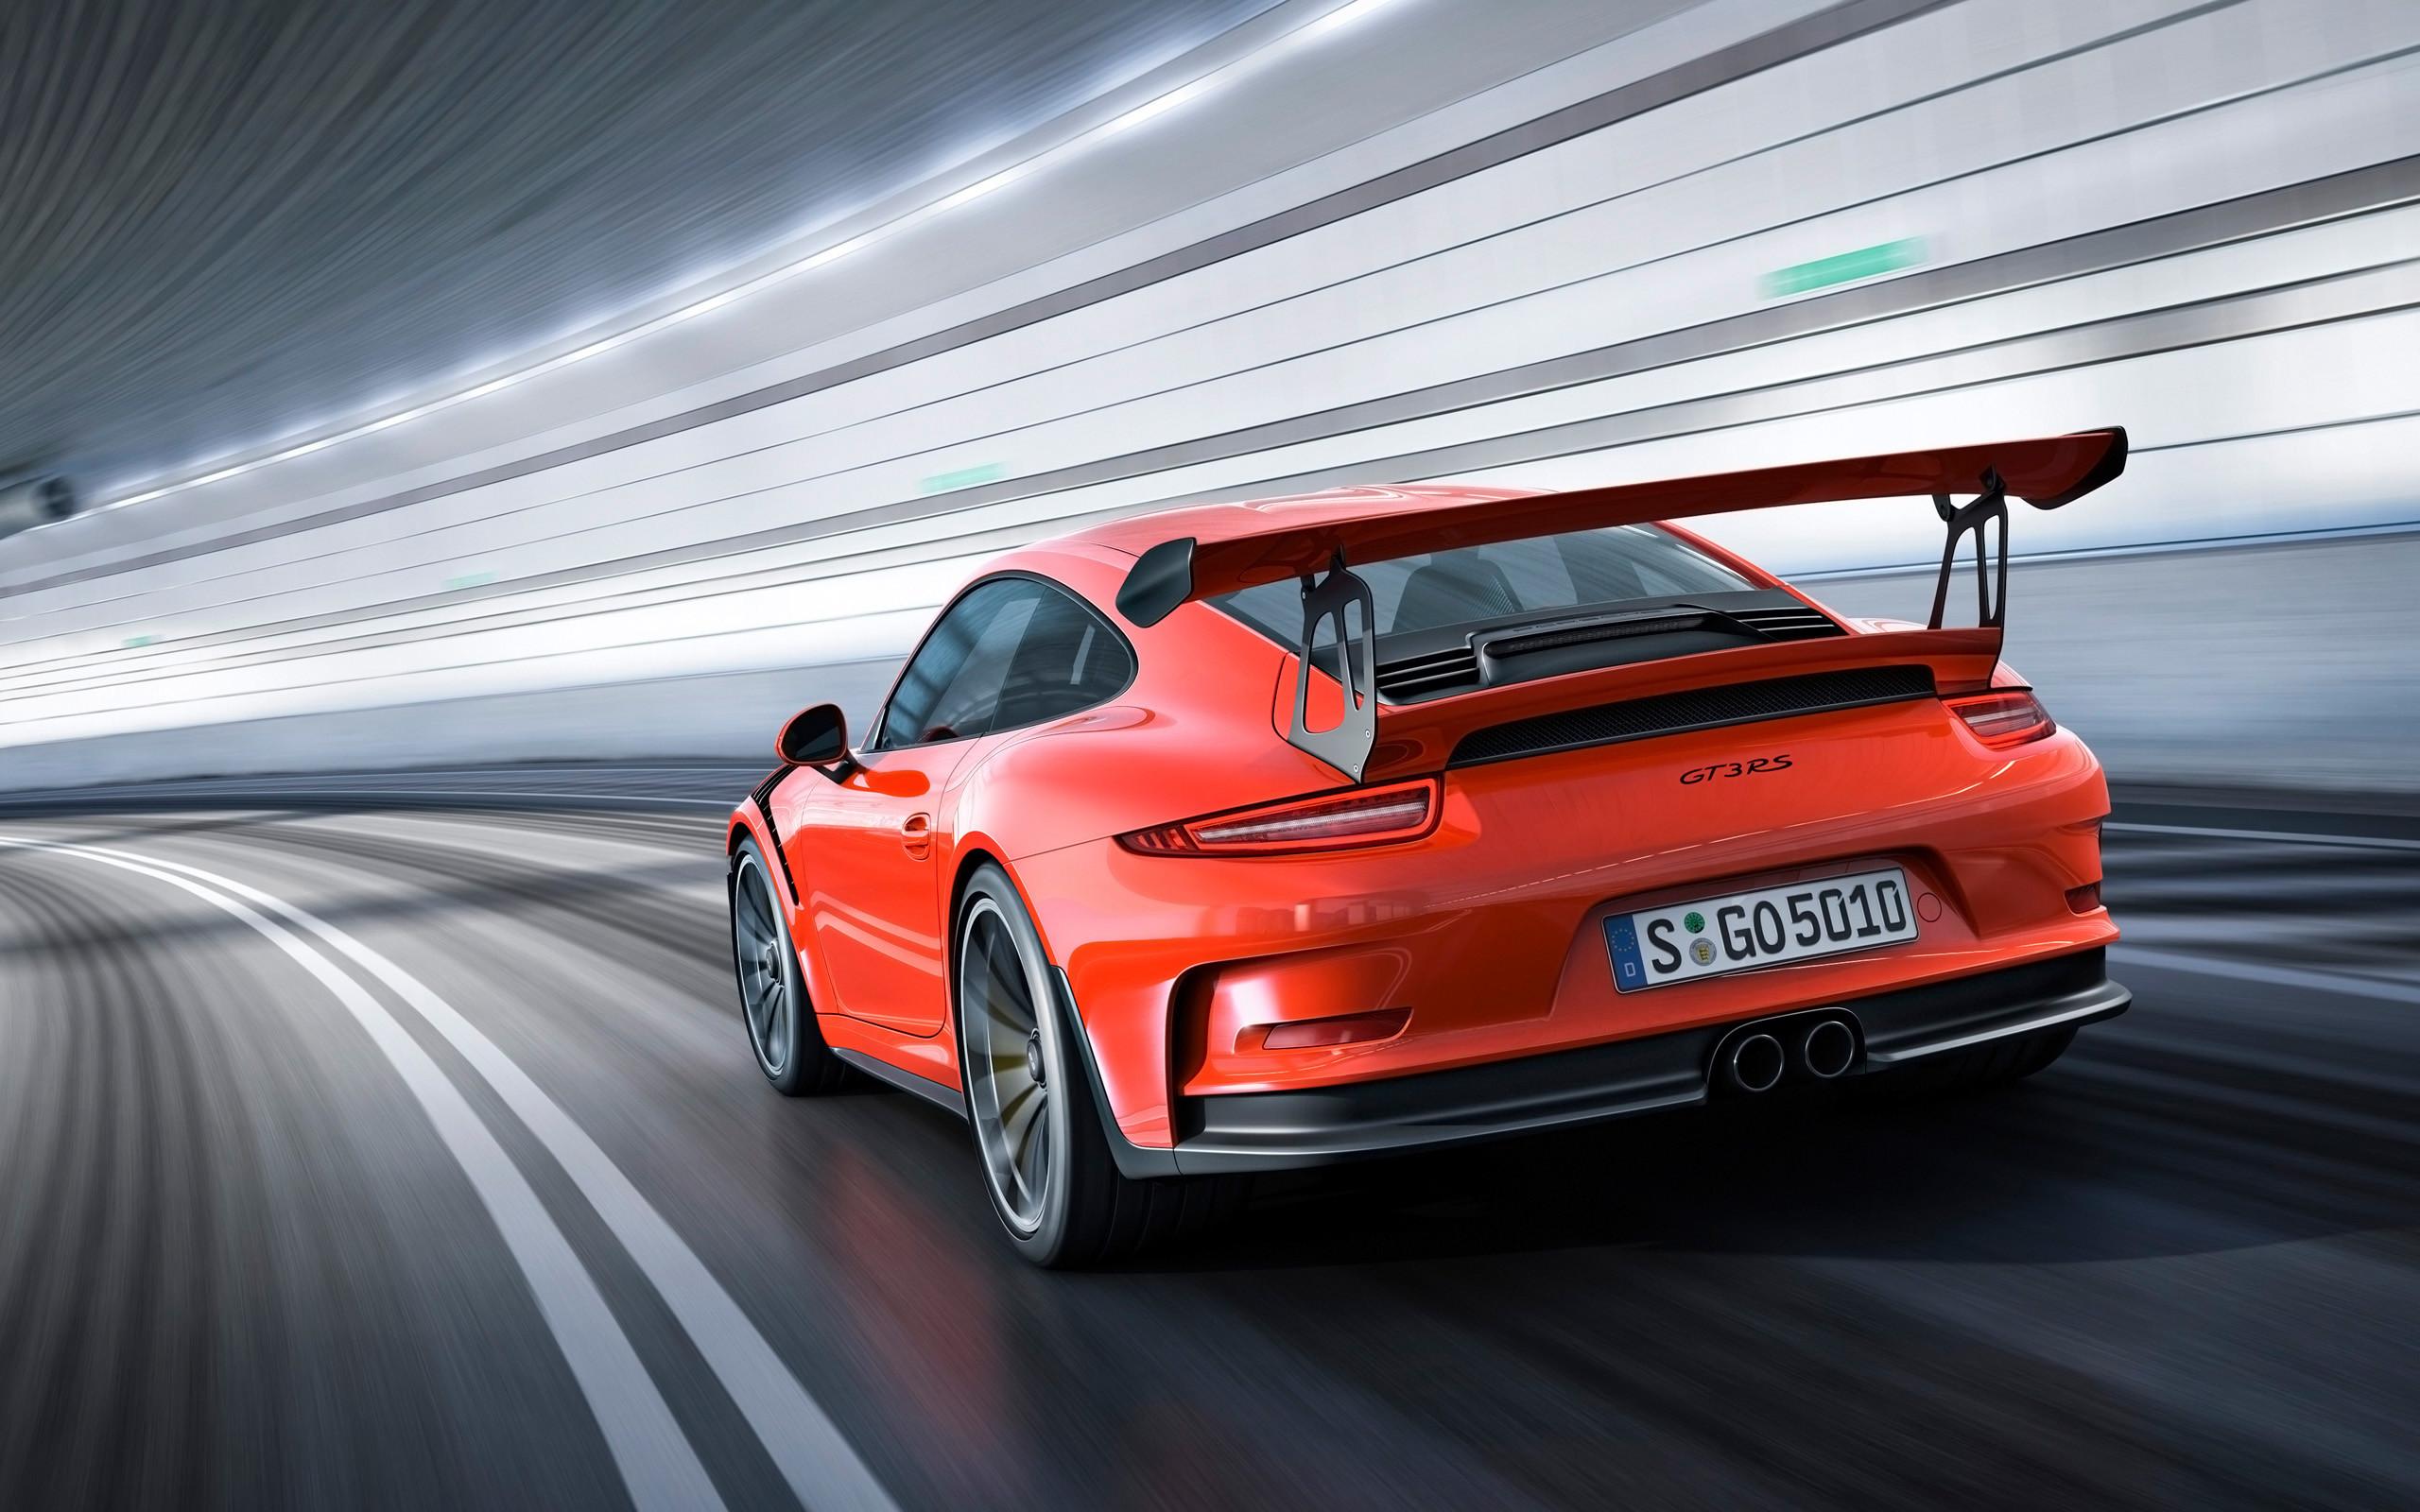 2560x1600 Awesome 2015 Porsche 911 GT3 RS Wallpaper 47495